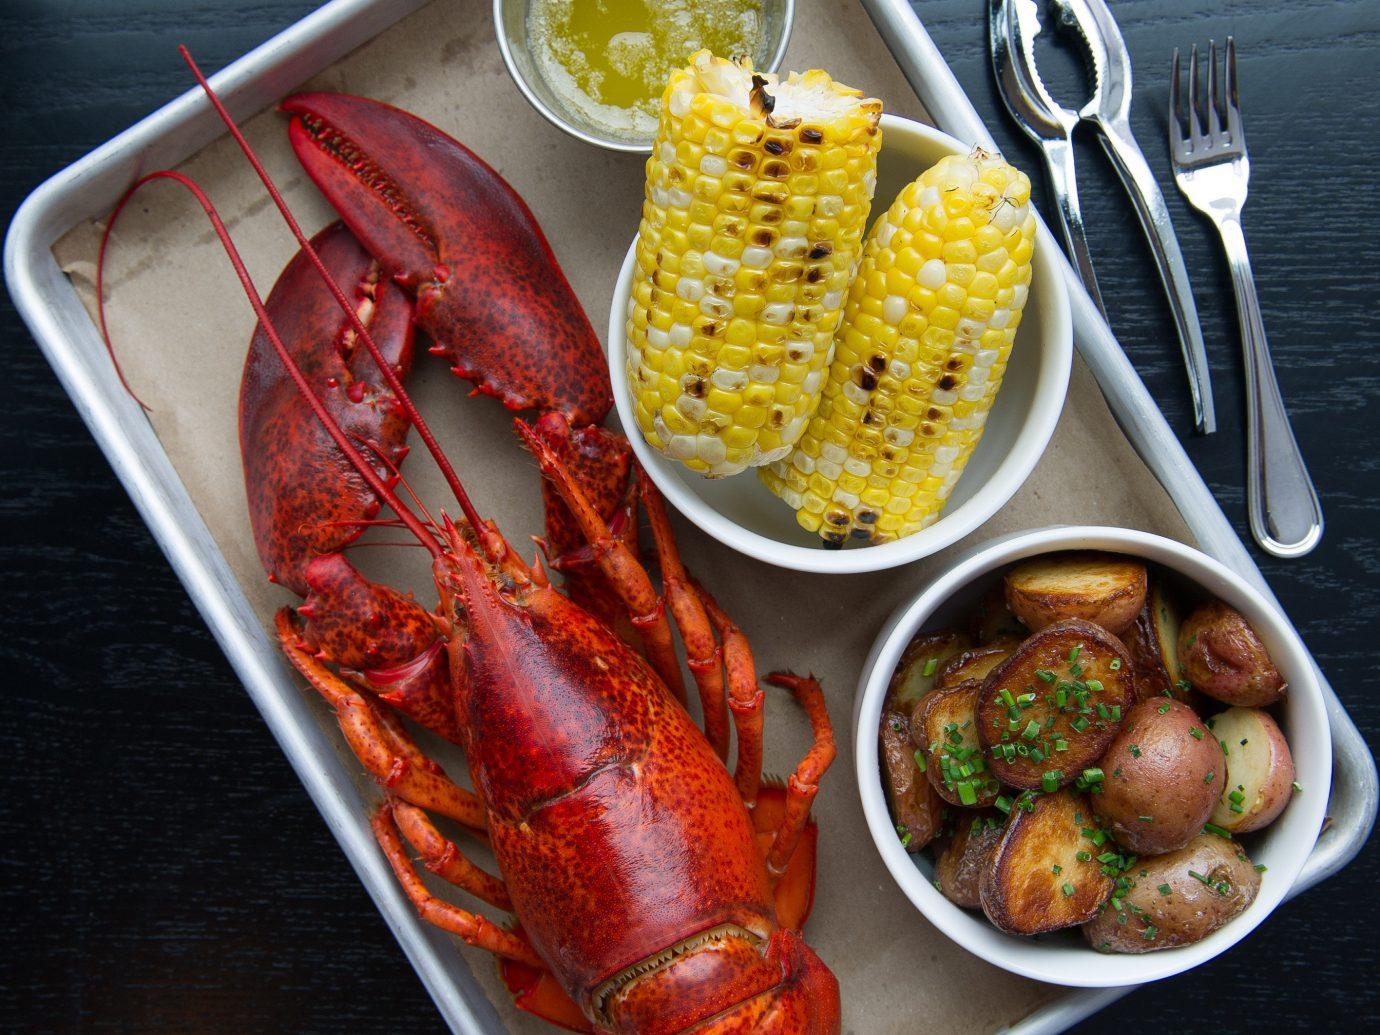 Secret Getaways Trip Ideas food table plate dish meal Seafood fish lobster animal source foods seafood boil produce invertebrate container decapoda cuisine crustacean